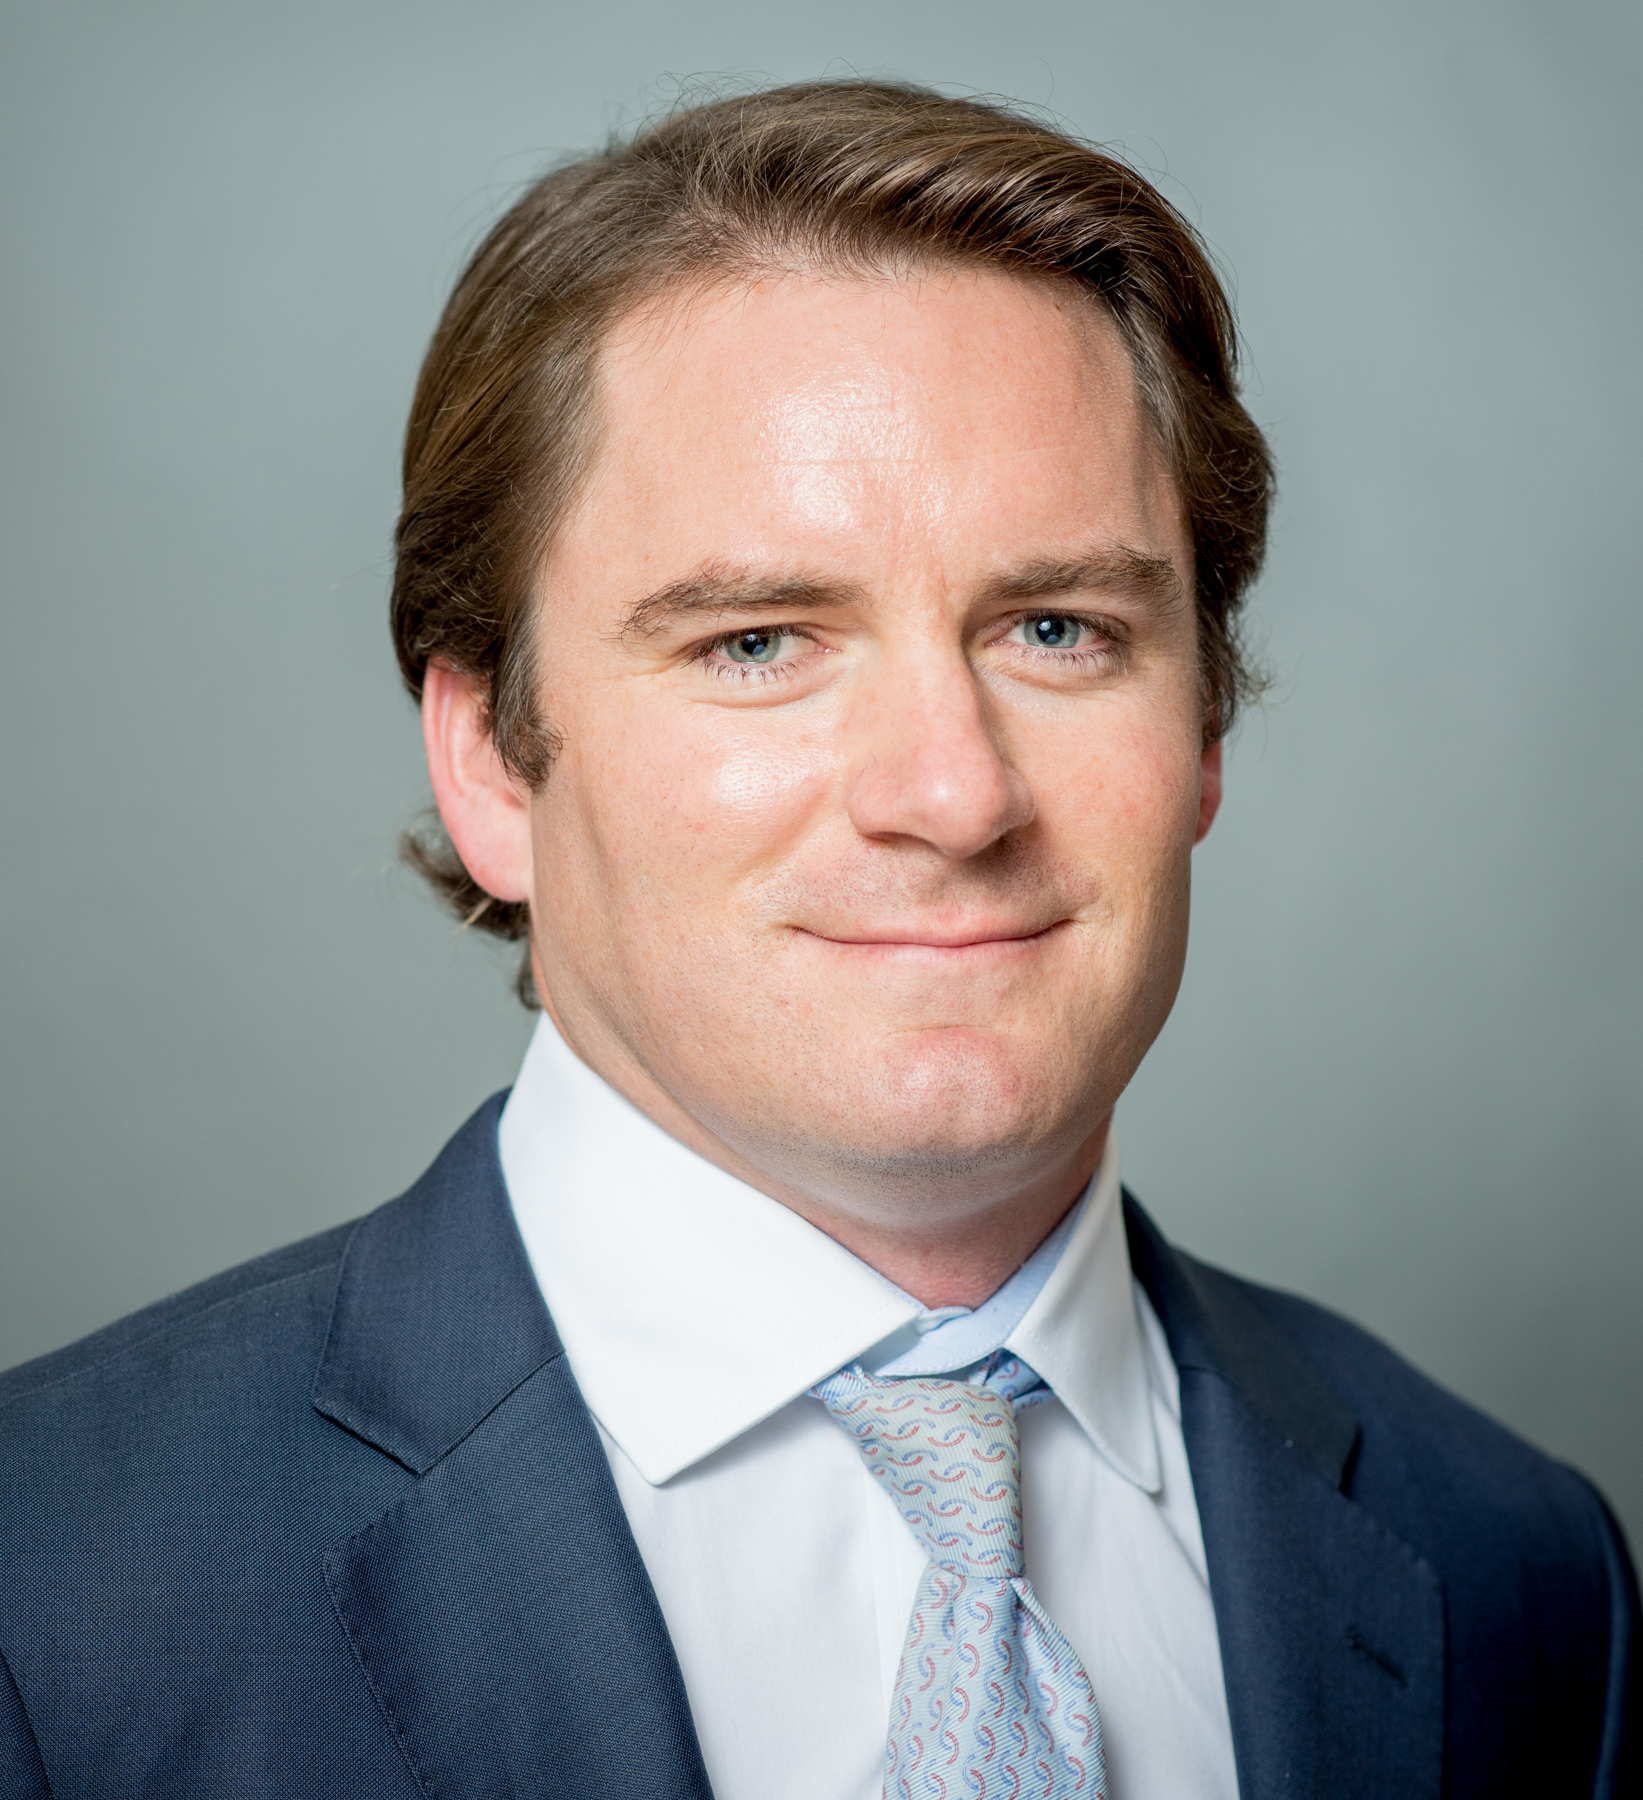 Andrew O'Shea Headshot   Dakota Investments